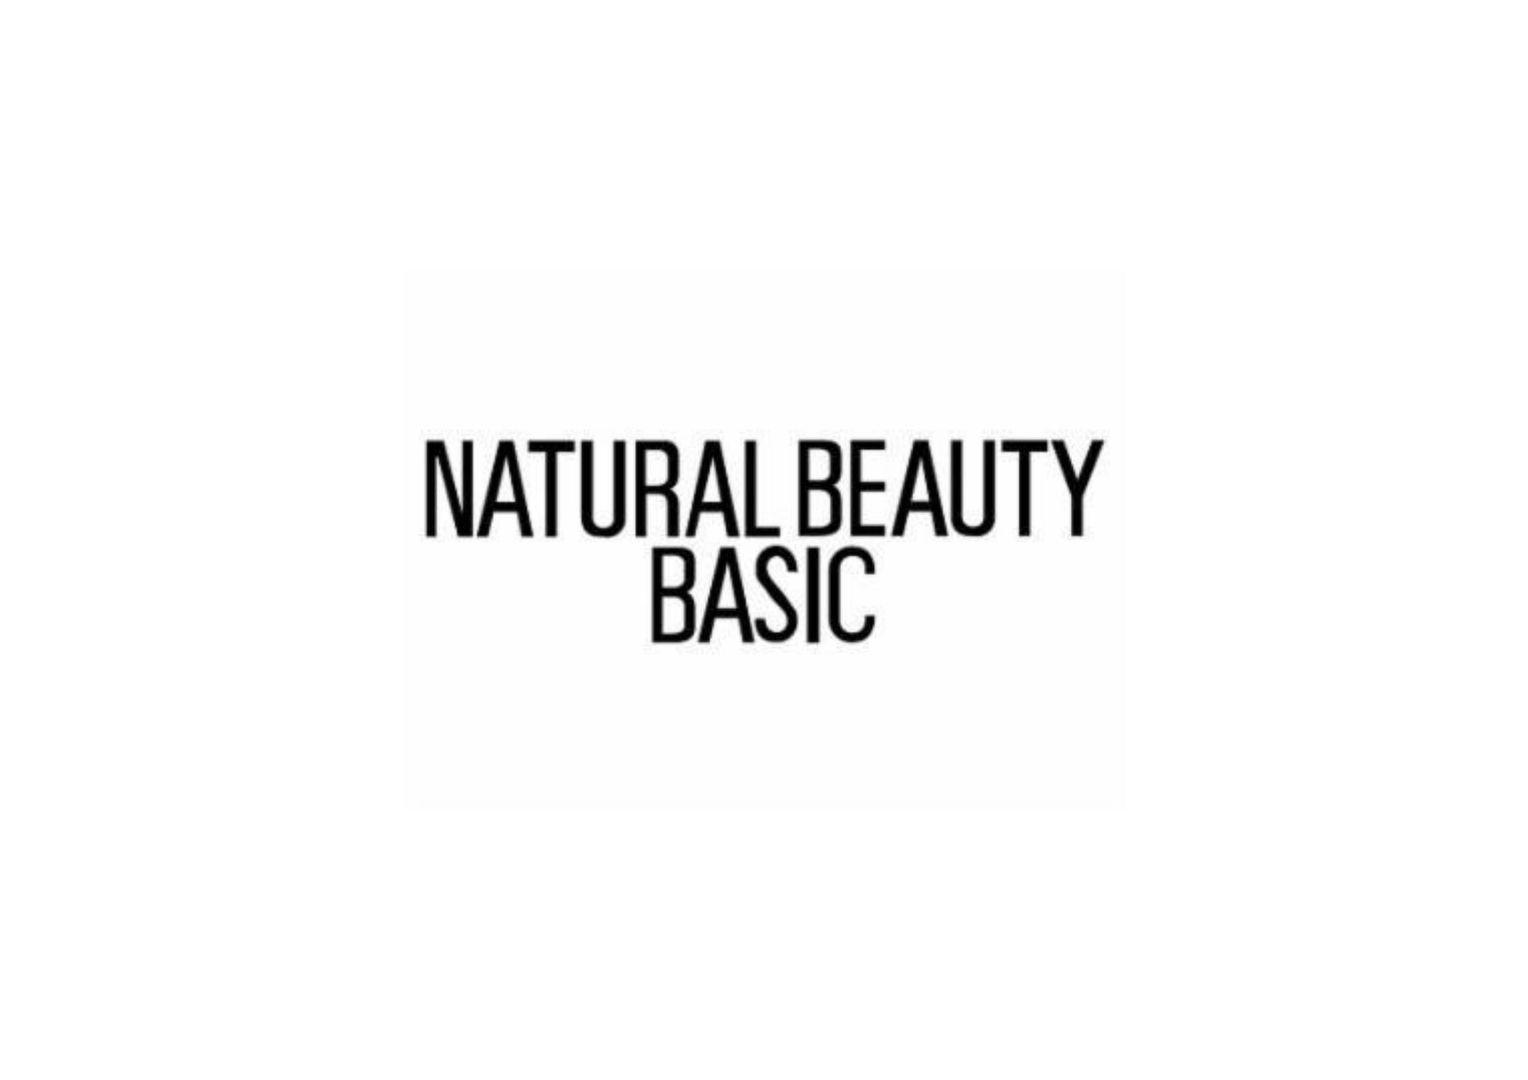 NATURAL BEAUTY BASIC 木更津 / TRMN07804のカバー写真